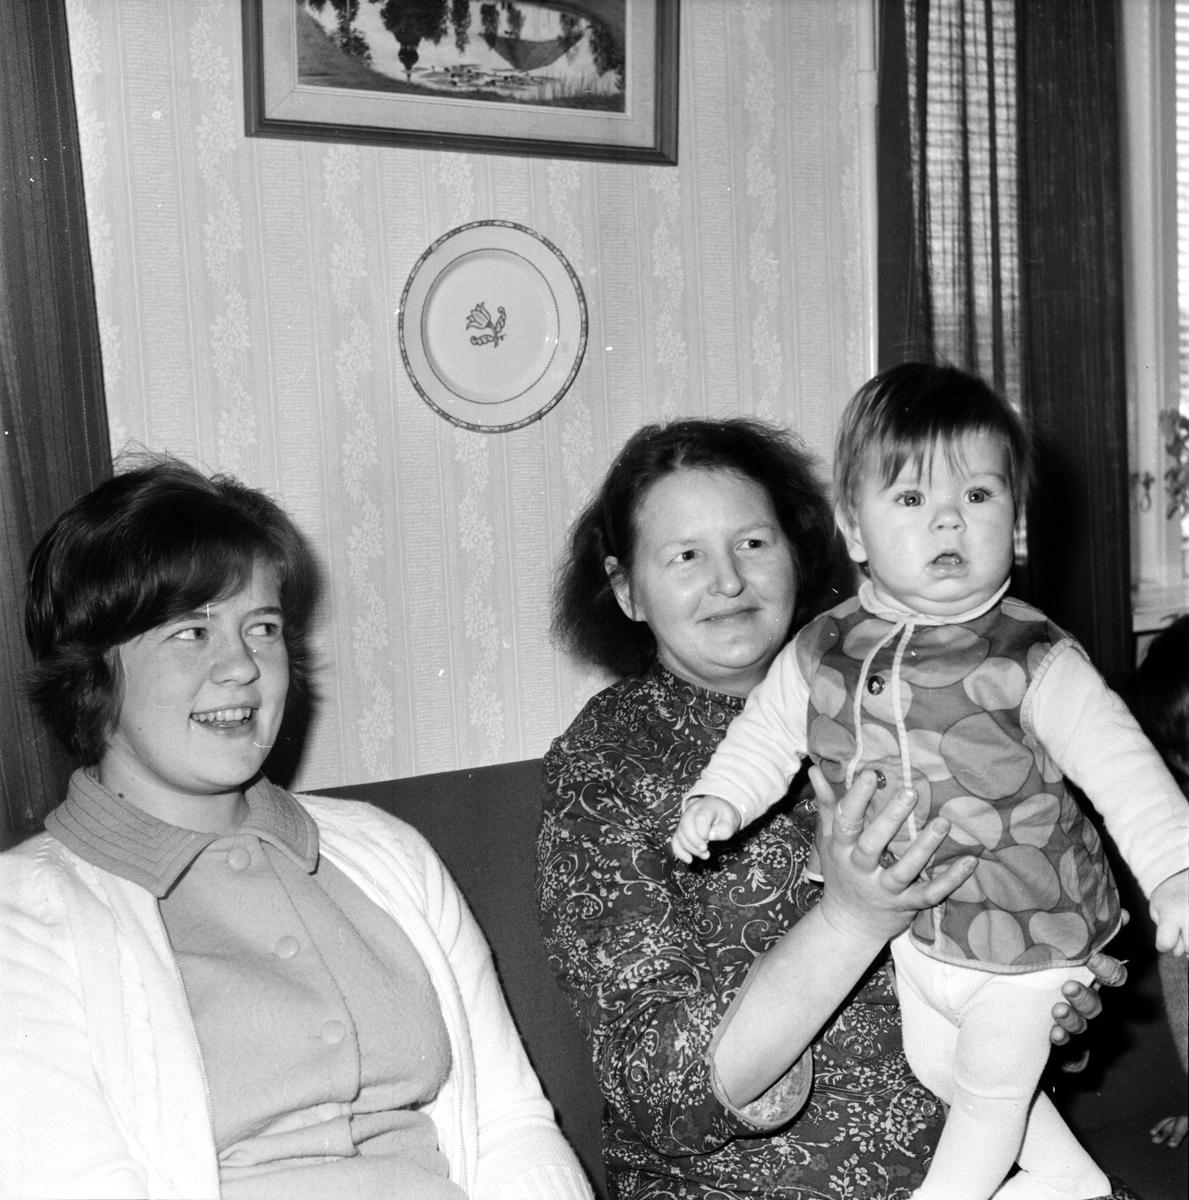 Simeå, Familjen Herbert Solini Eliases, Jan 1970